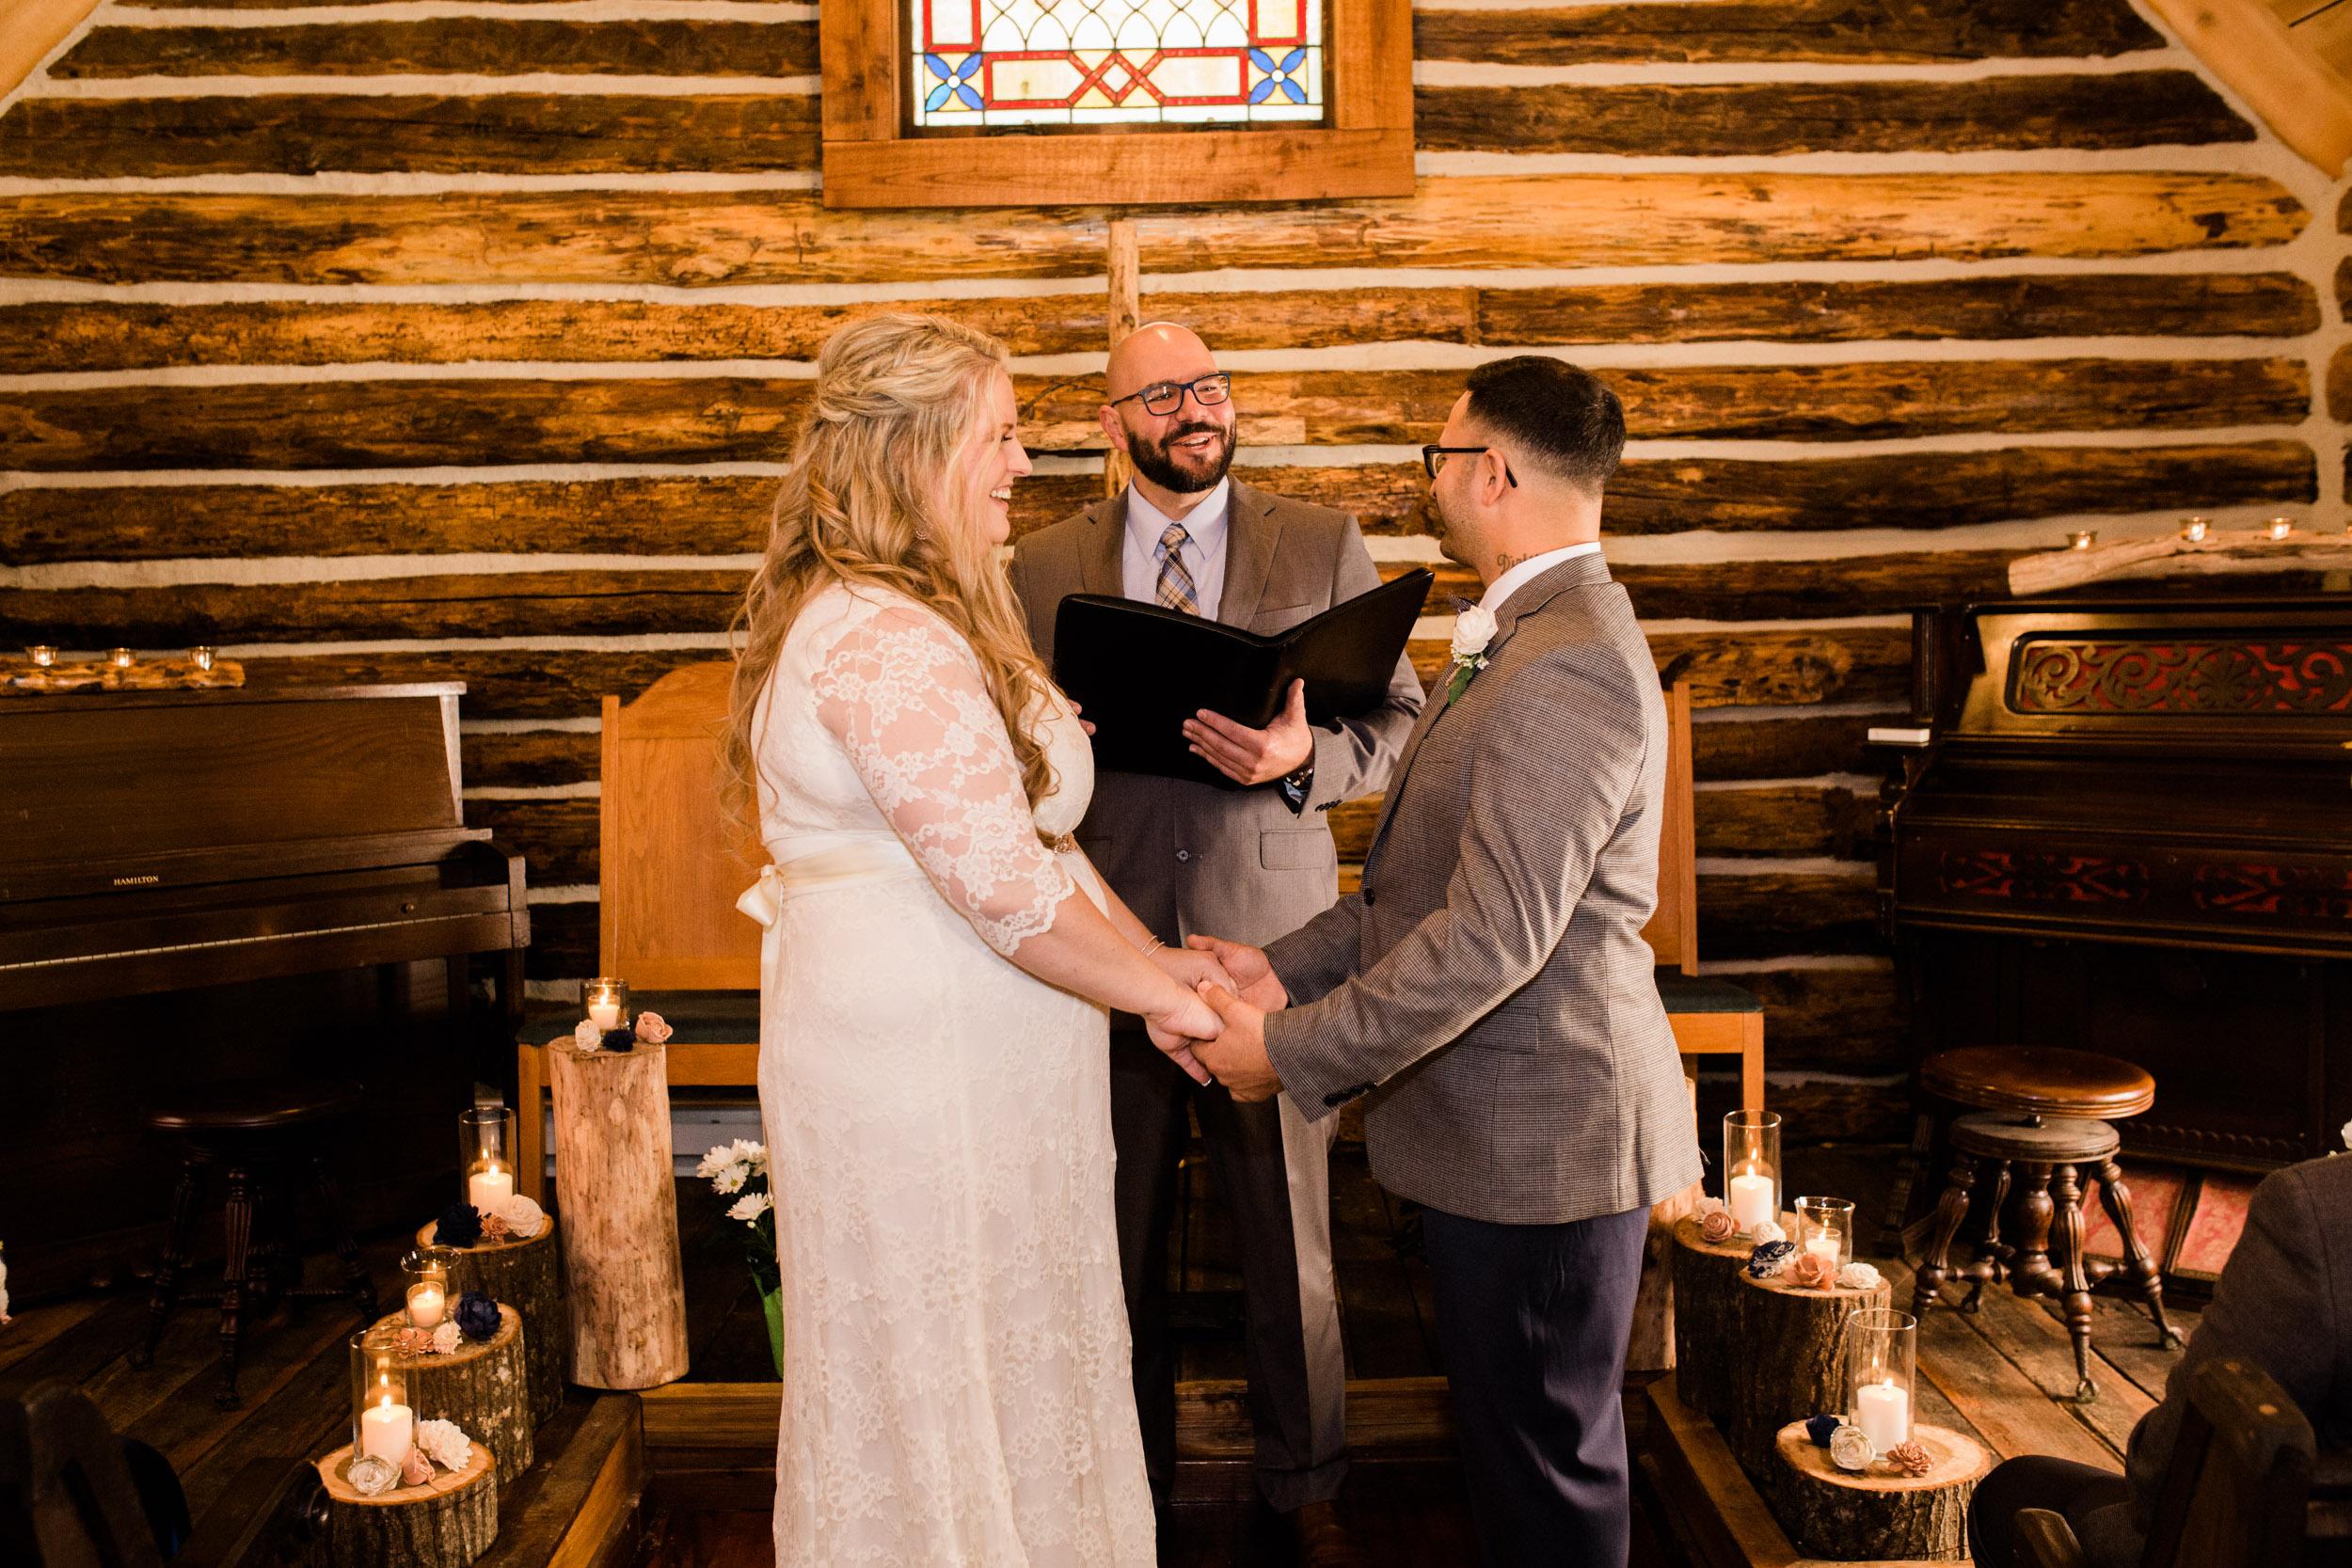 stephanie wedding photos (1 of 1)-32.jpg